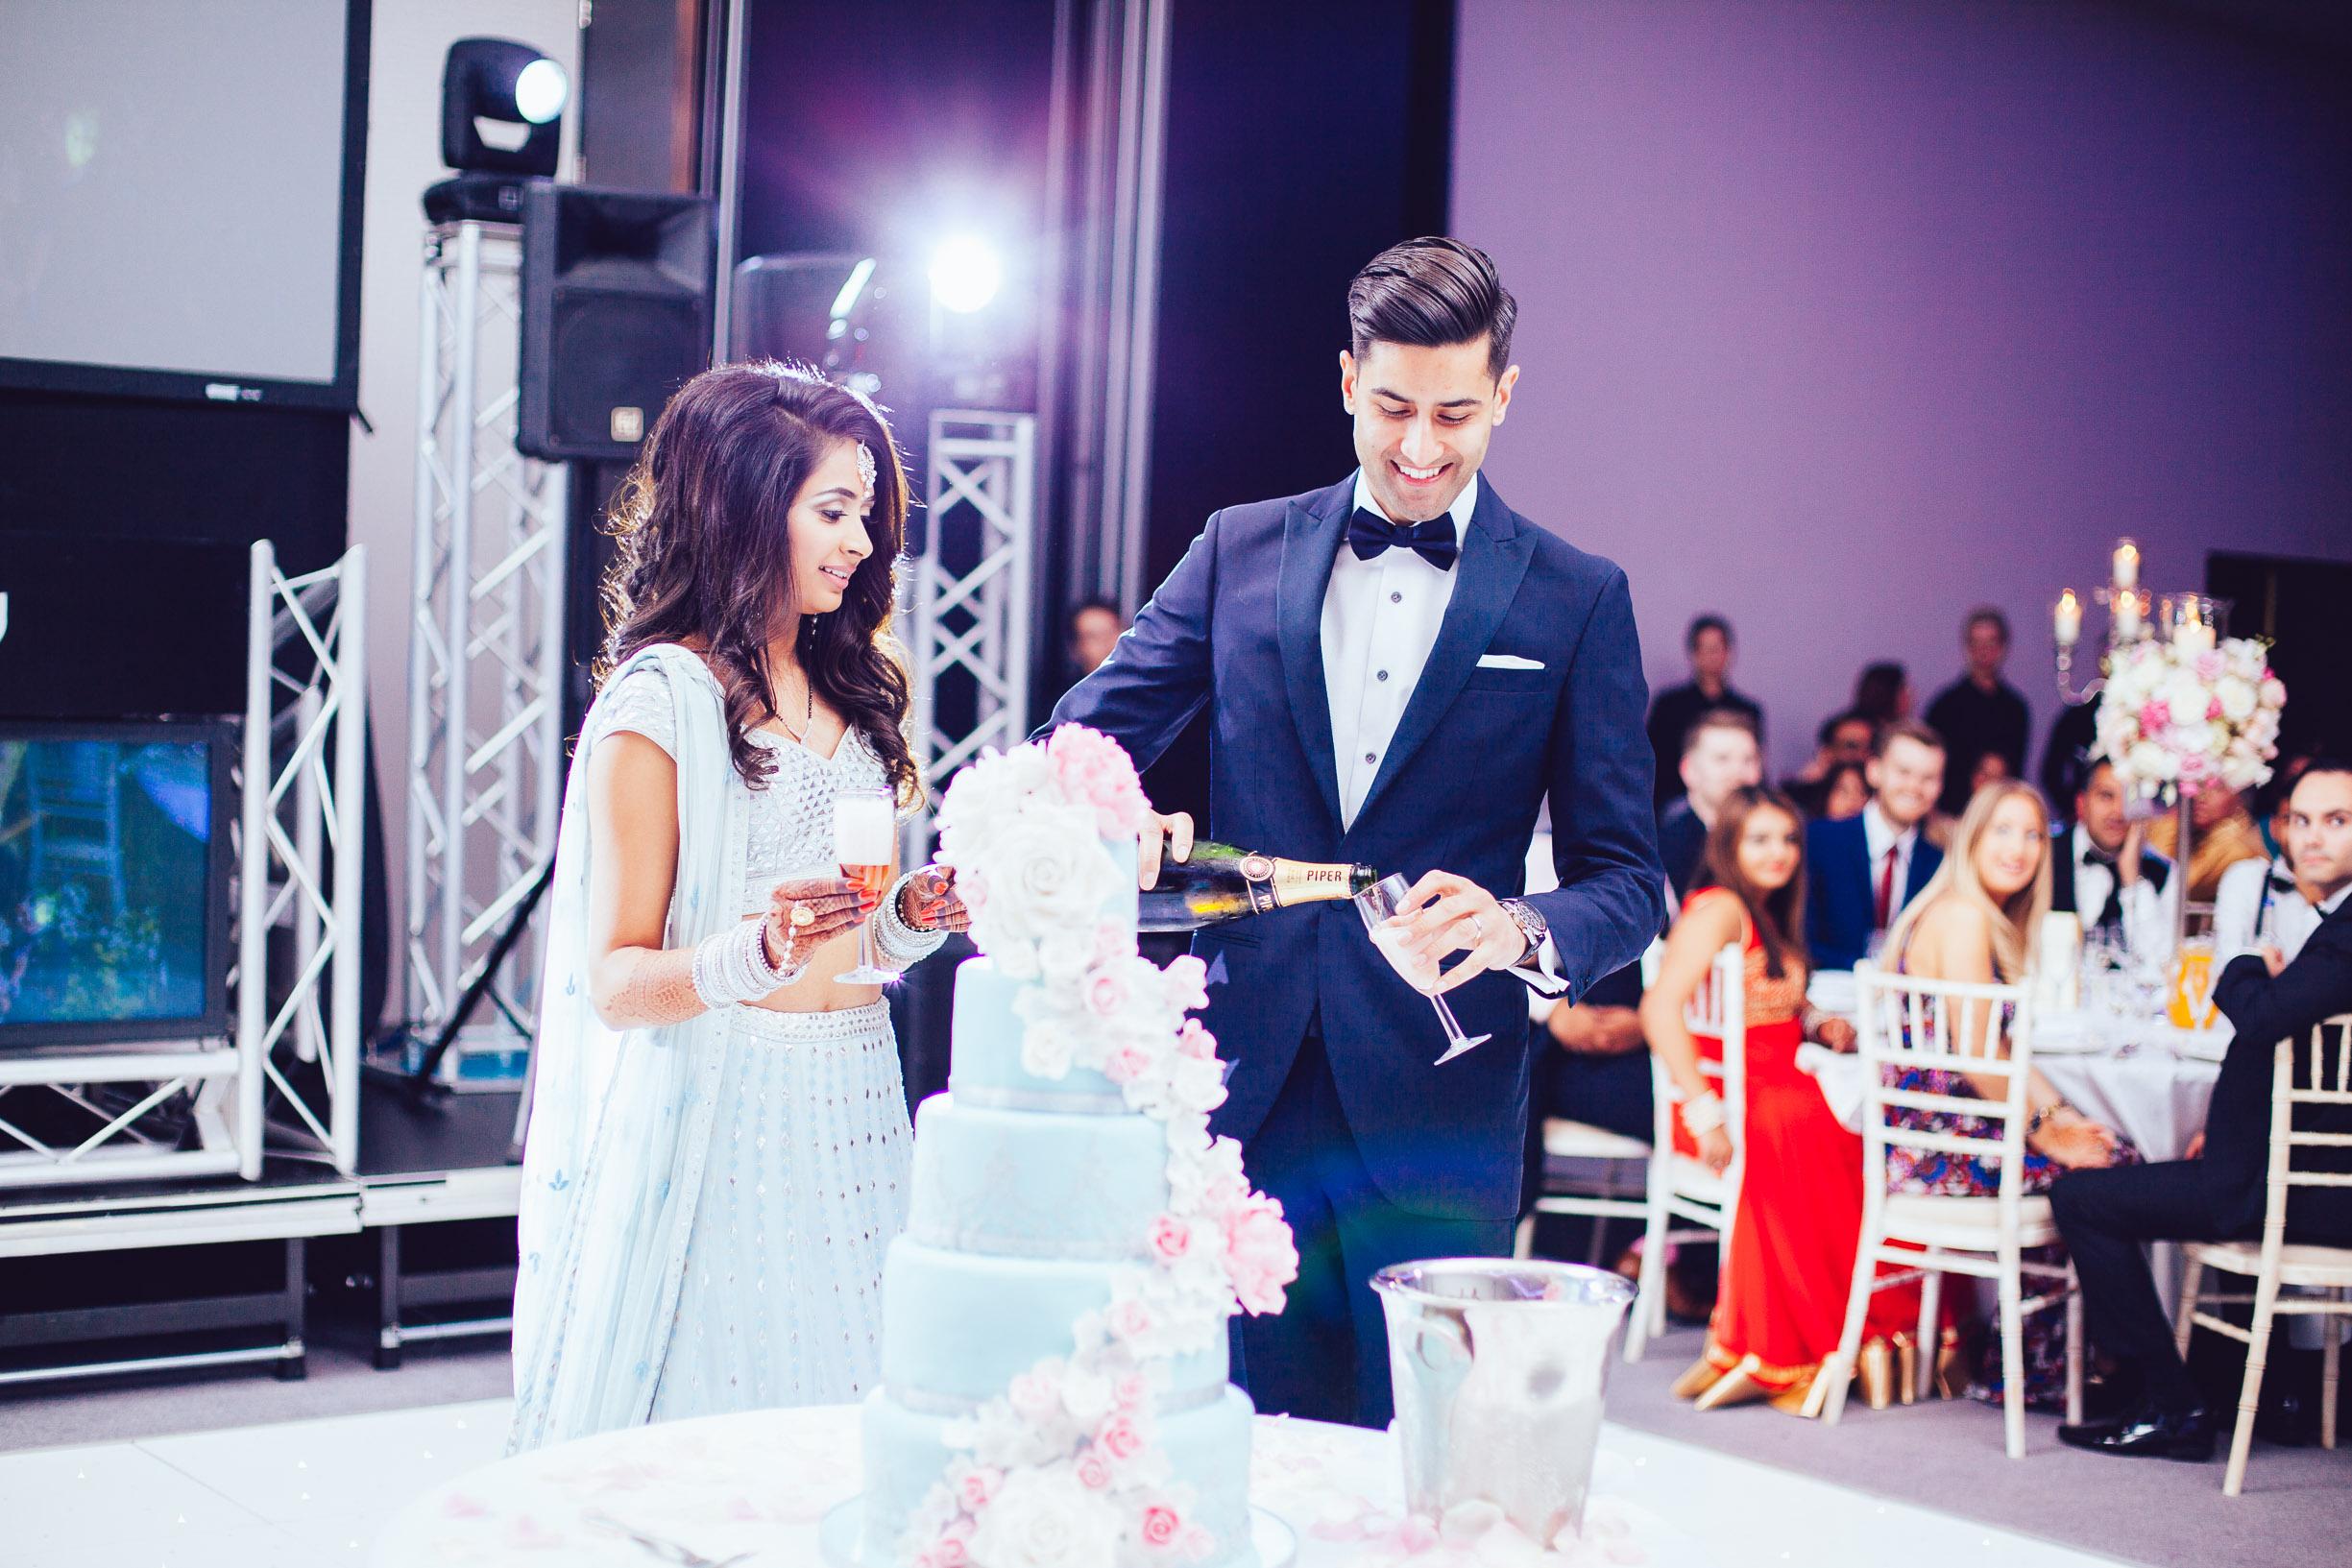 amit&ceema_eden_moments_wedding_photography-28